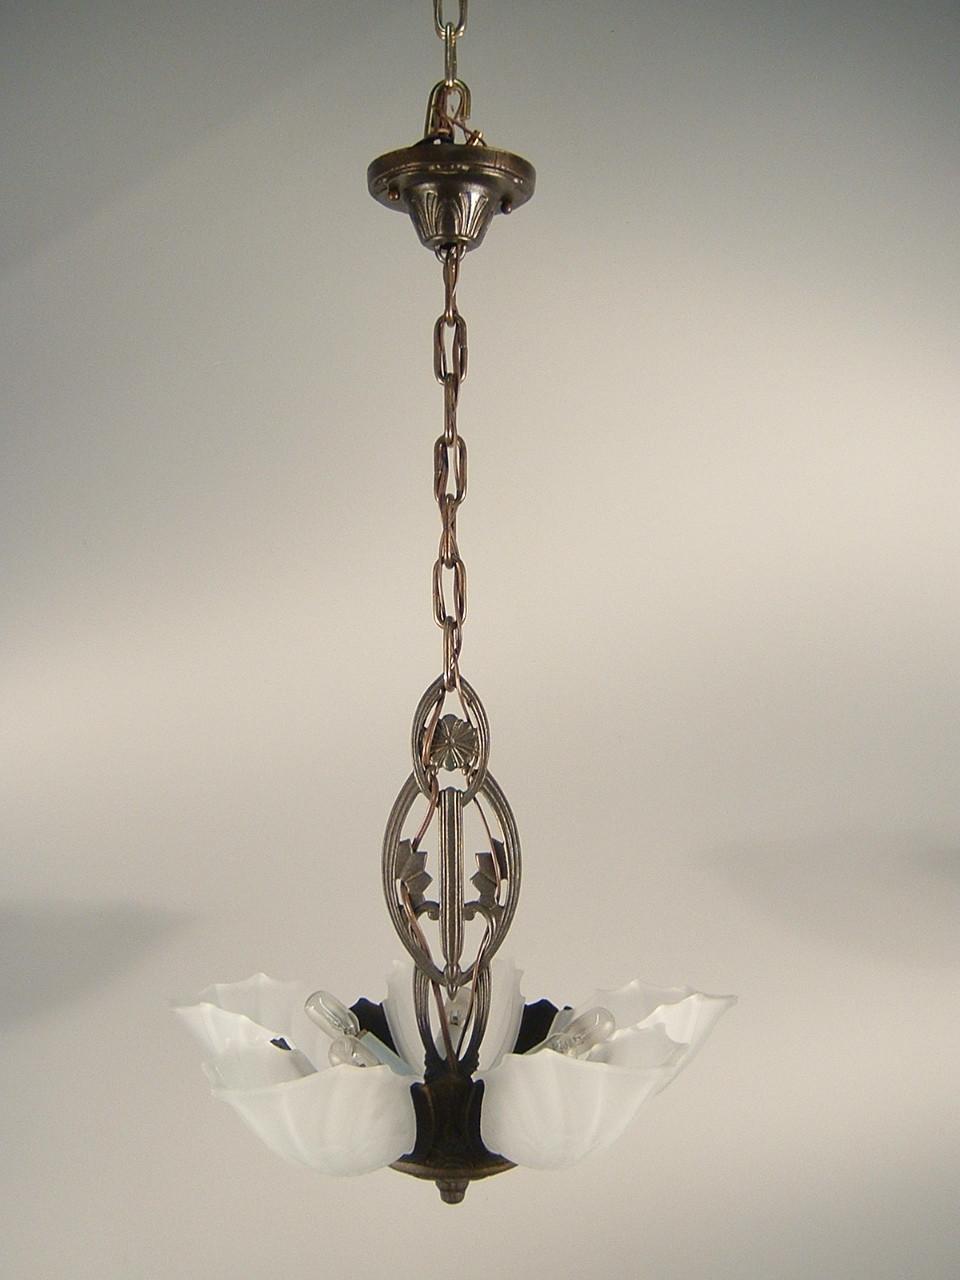 Art deco pendant fixture 5 light 3 light renew gallery for Artistic pendant lights